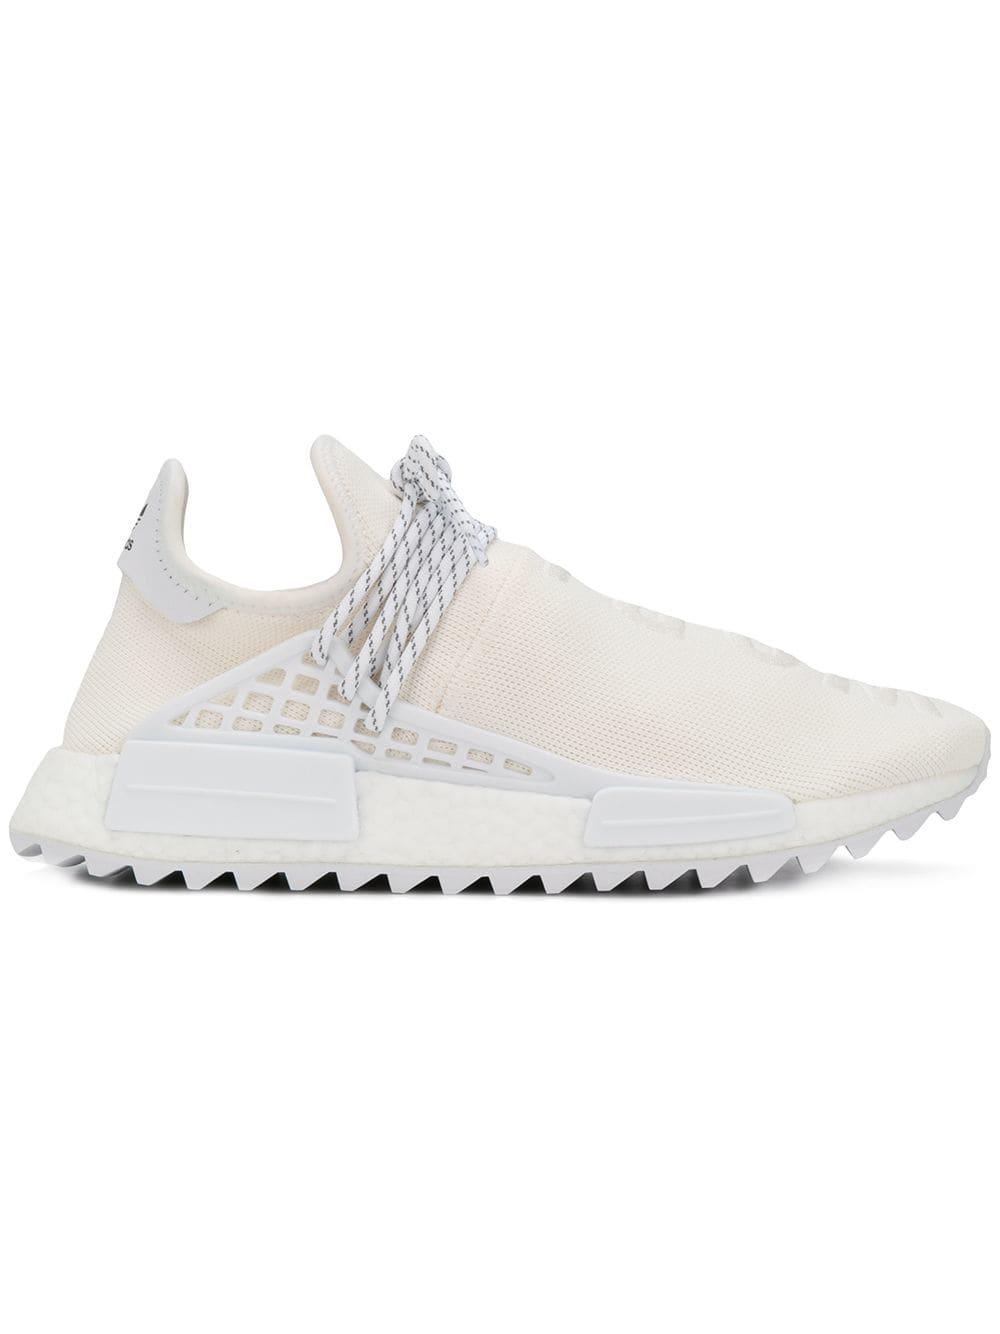 fe49119d6 Adidas Originals X Pharrell Williams Adidas Hu Holi Nmd Mc Sneakers - White